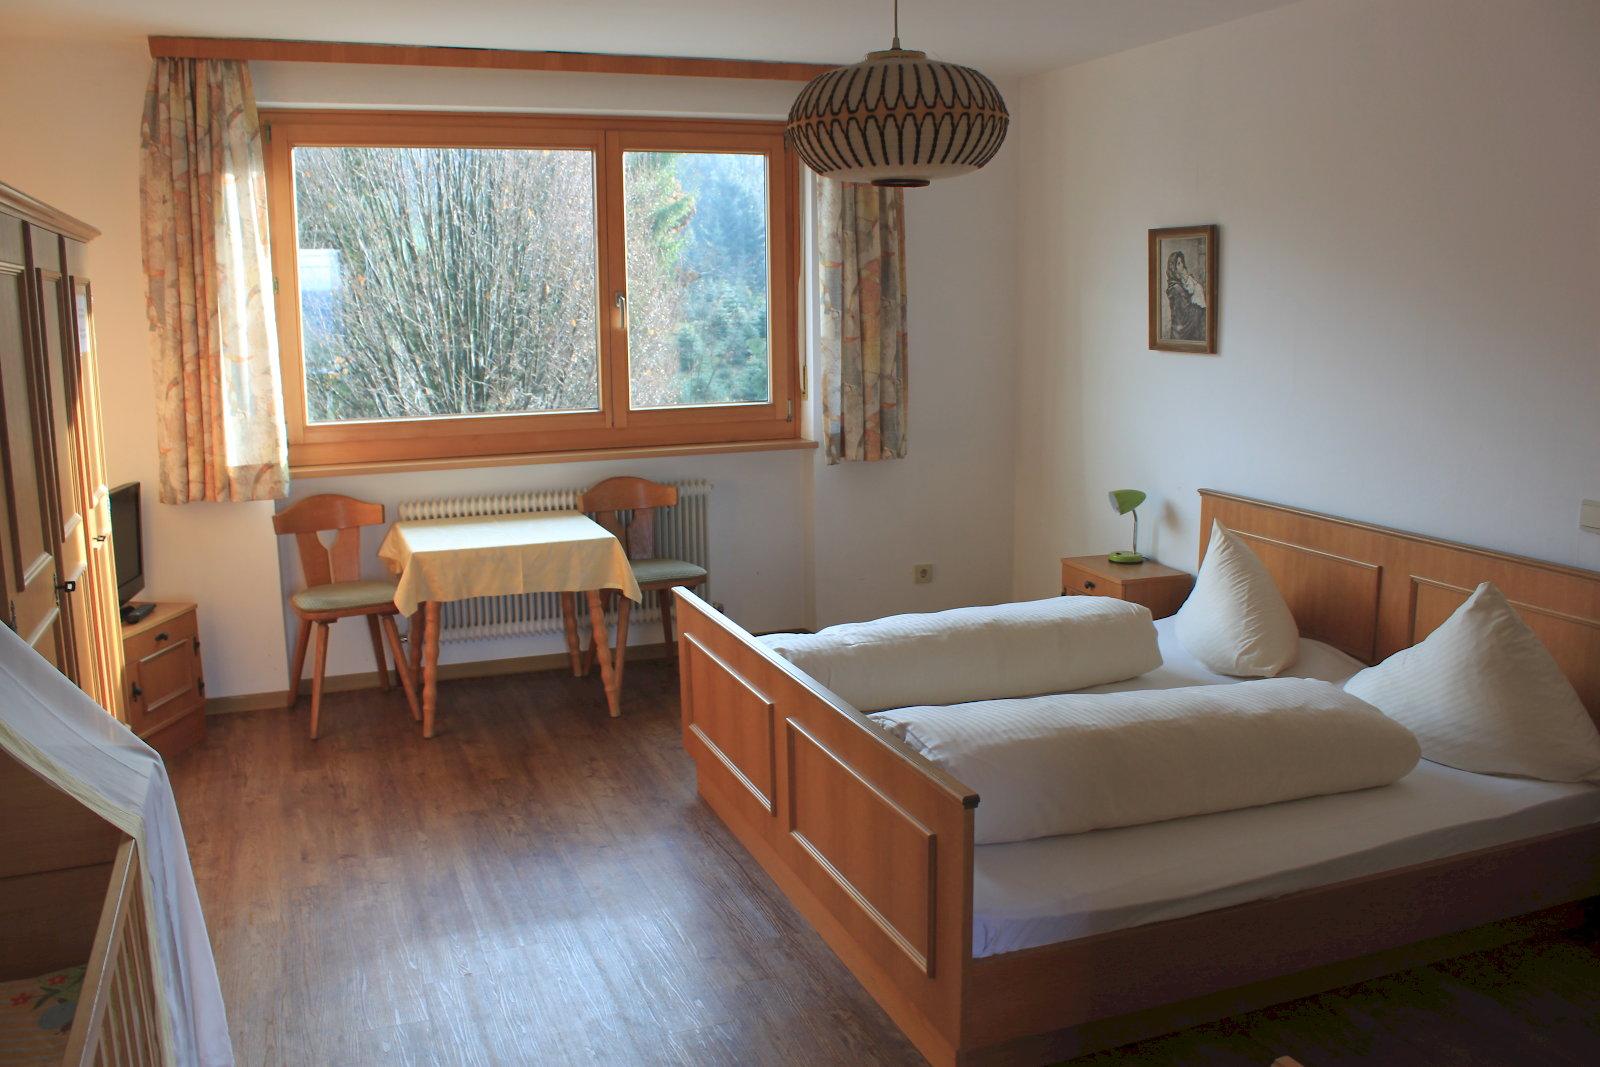 Appartement de vacances B&B - Restaurant TSINGDAO (Hörbranz). Doppelzimmer (2437460), Hörbranz, Bregenz, Vorarlberg, Autriche, image 7